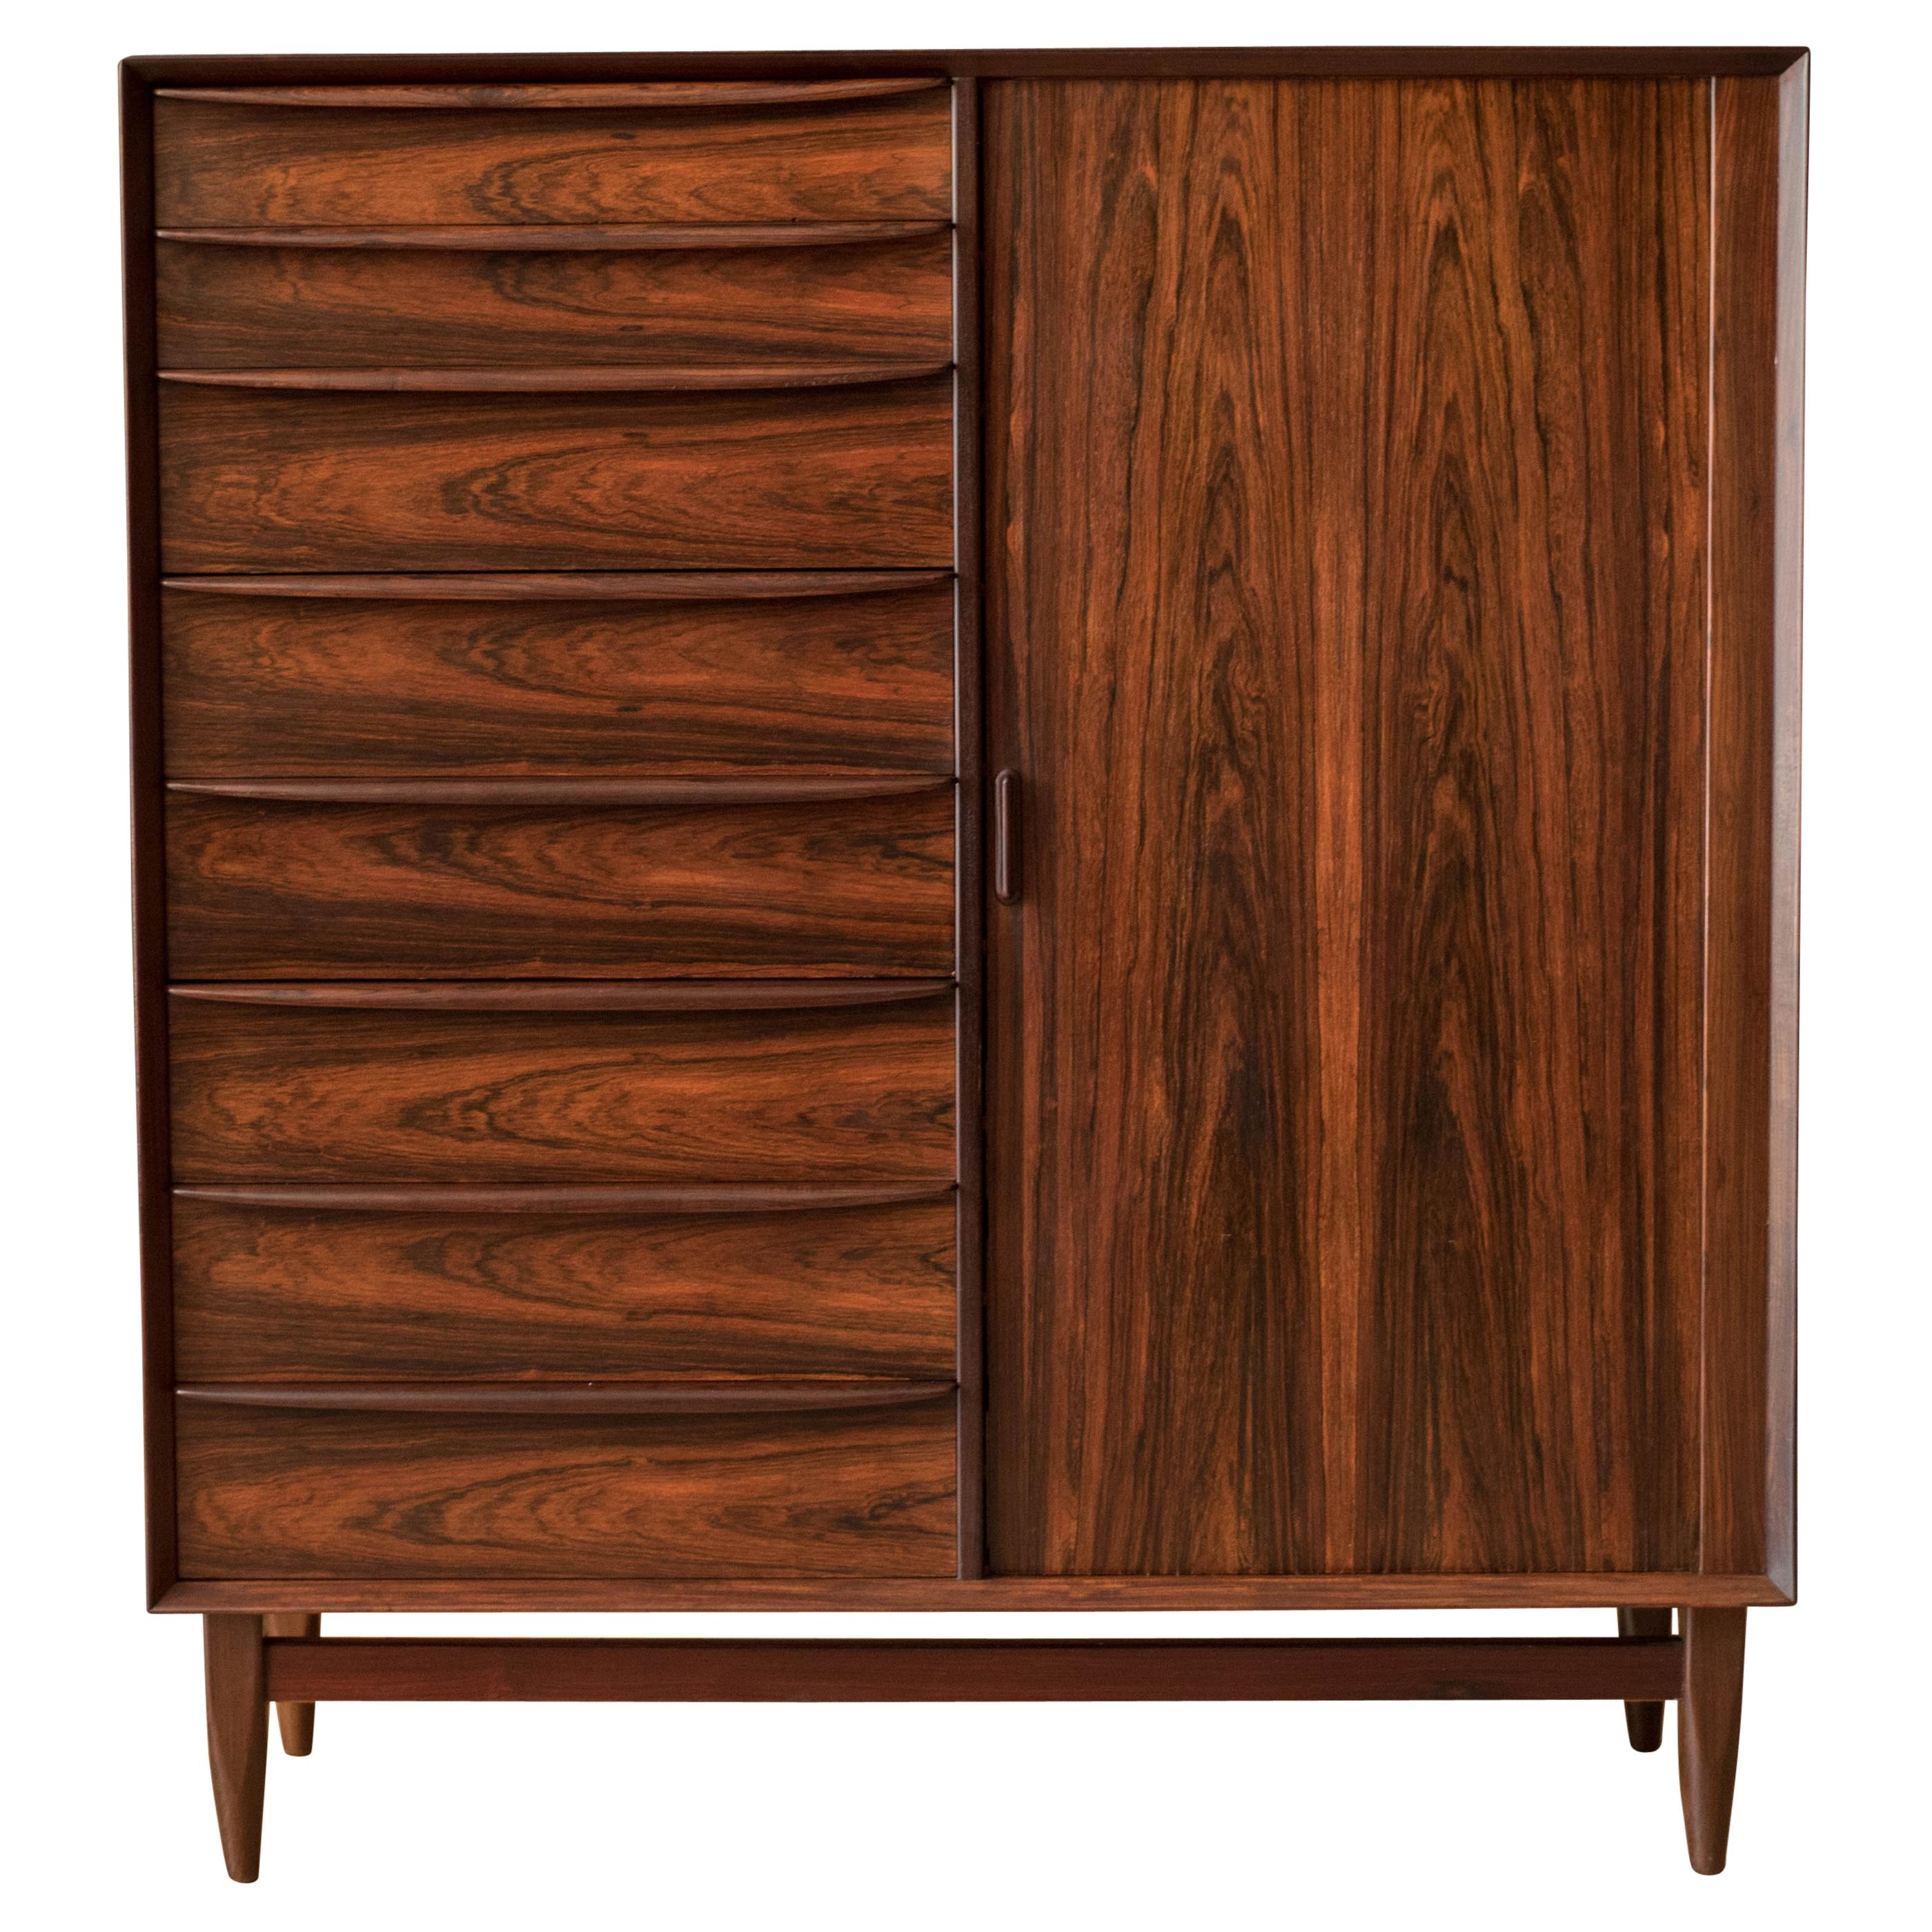 Danish Tall Rosewood Falster Dresser Chest by Svend Madsen